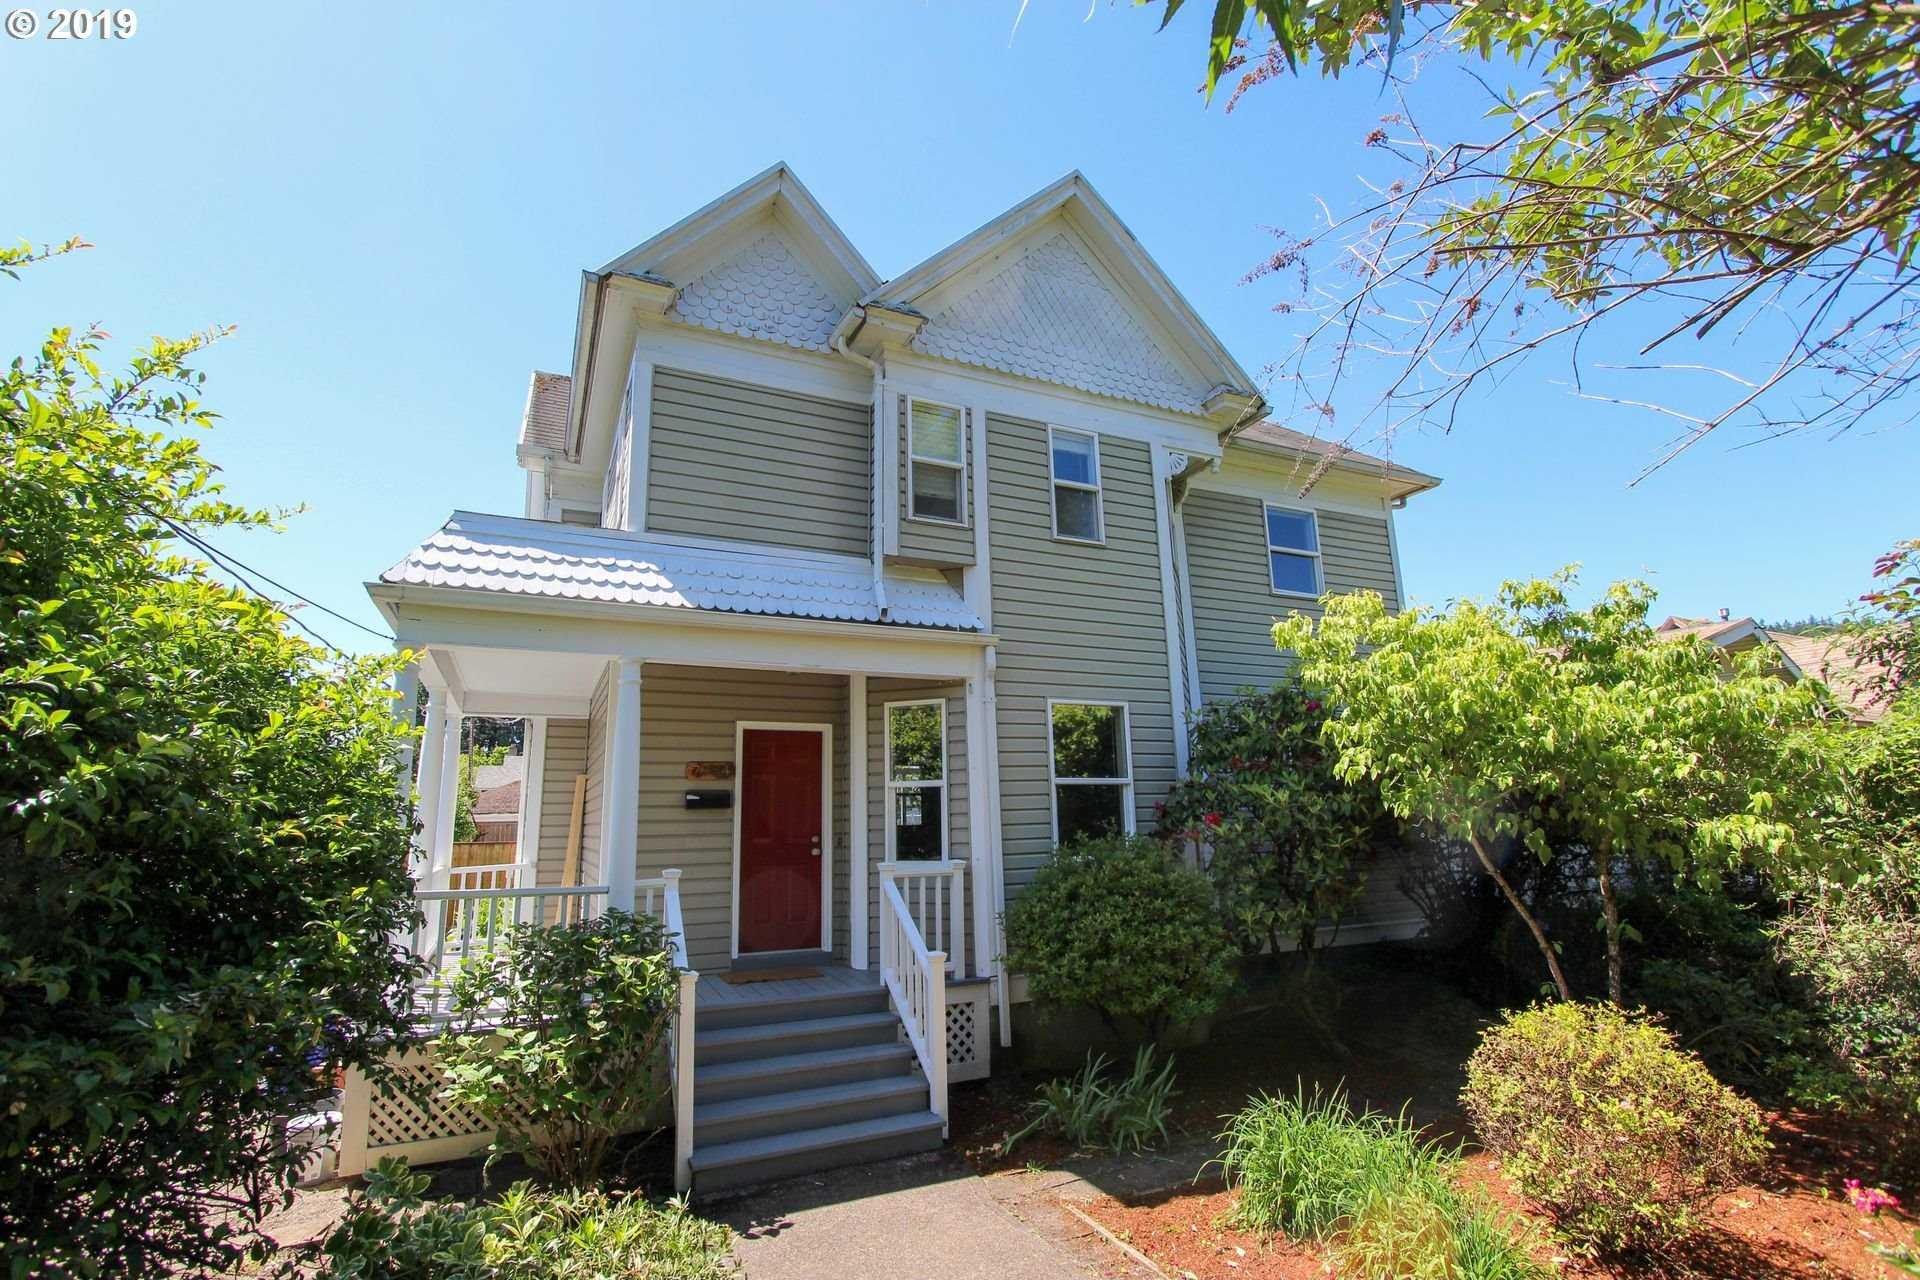 $529,900 - 3Br/2Ba -  for Sale in Montavilla, Portland